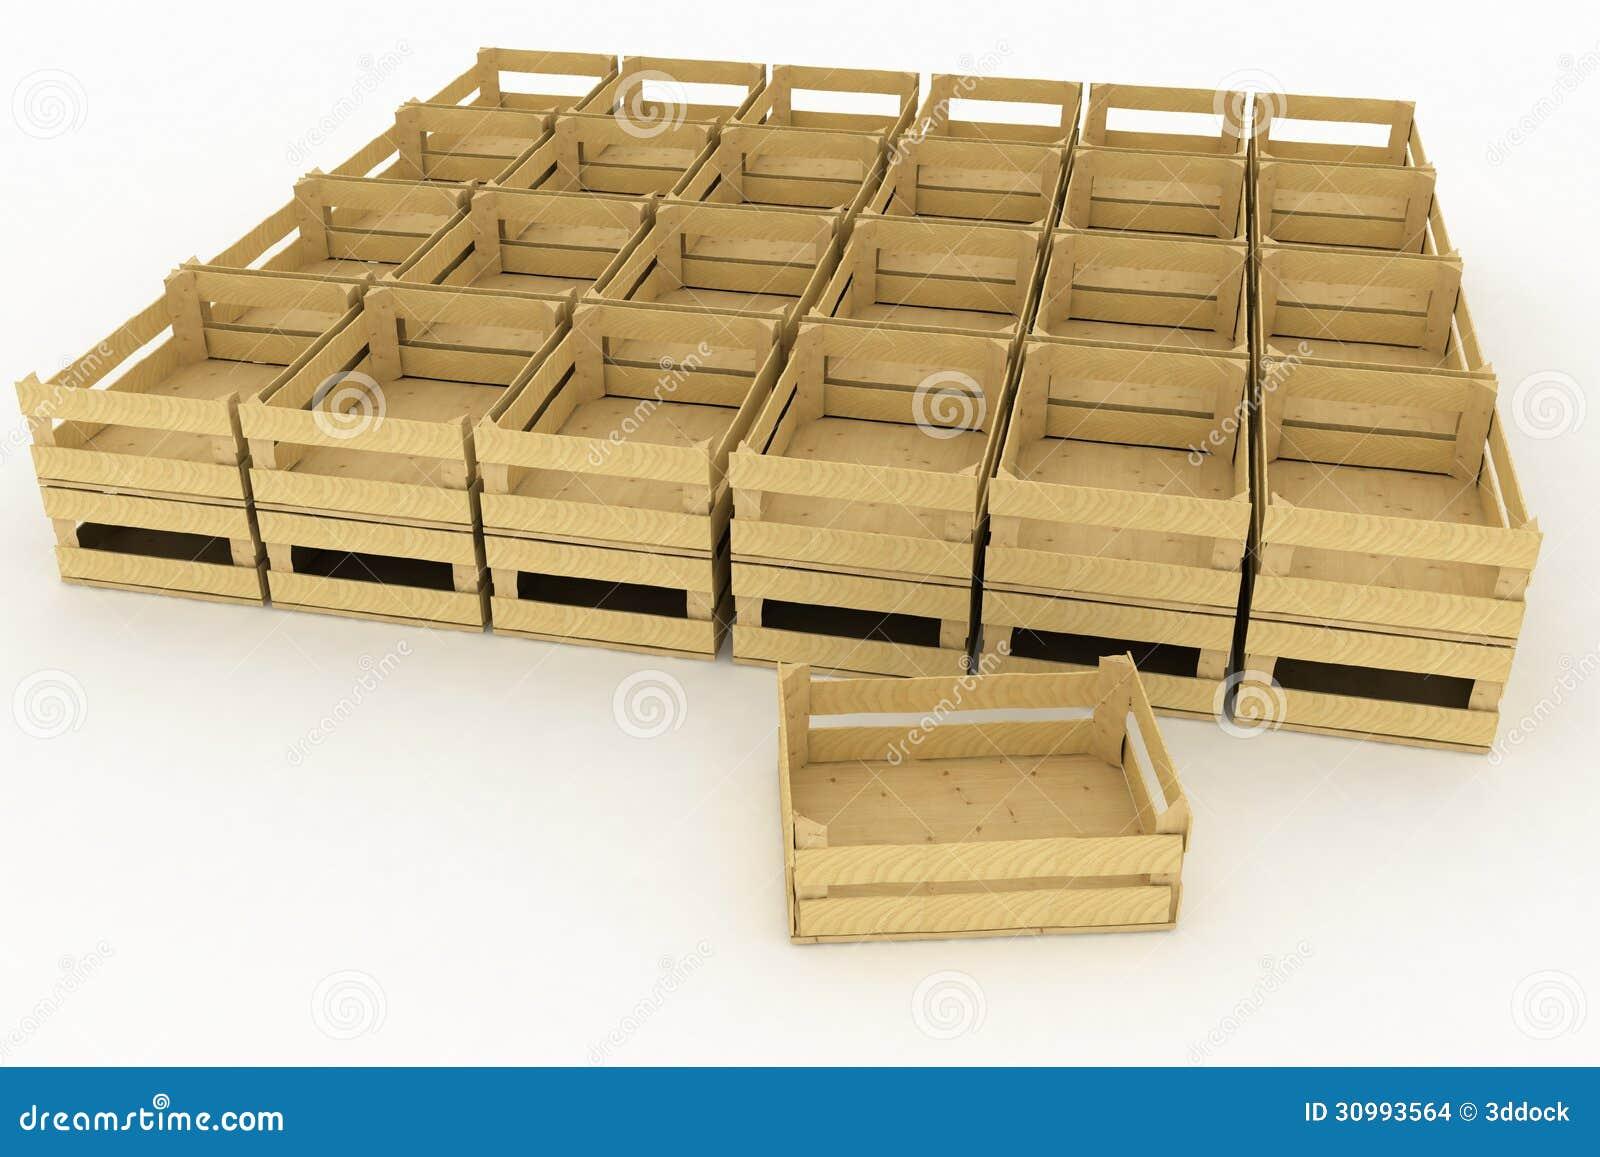 Leere holzkisten stockbilder bild 30993564 - Cajas de madera de fruta gratis ...